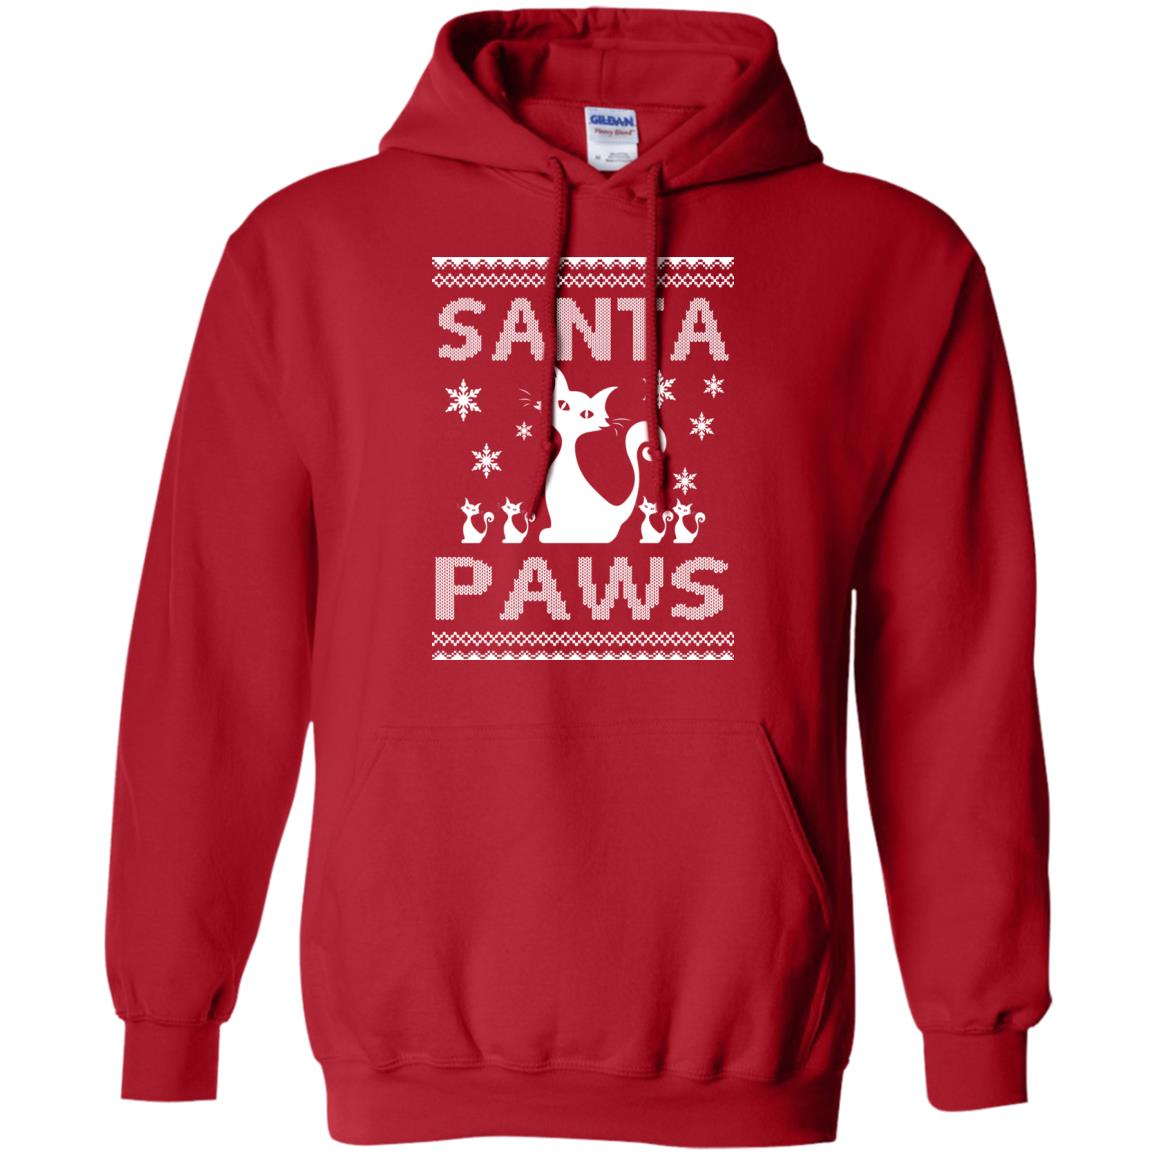 image 1677 - Santa Paws Cat Kitten Ugly Sweater, Christmas Sweatshirt